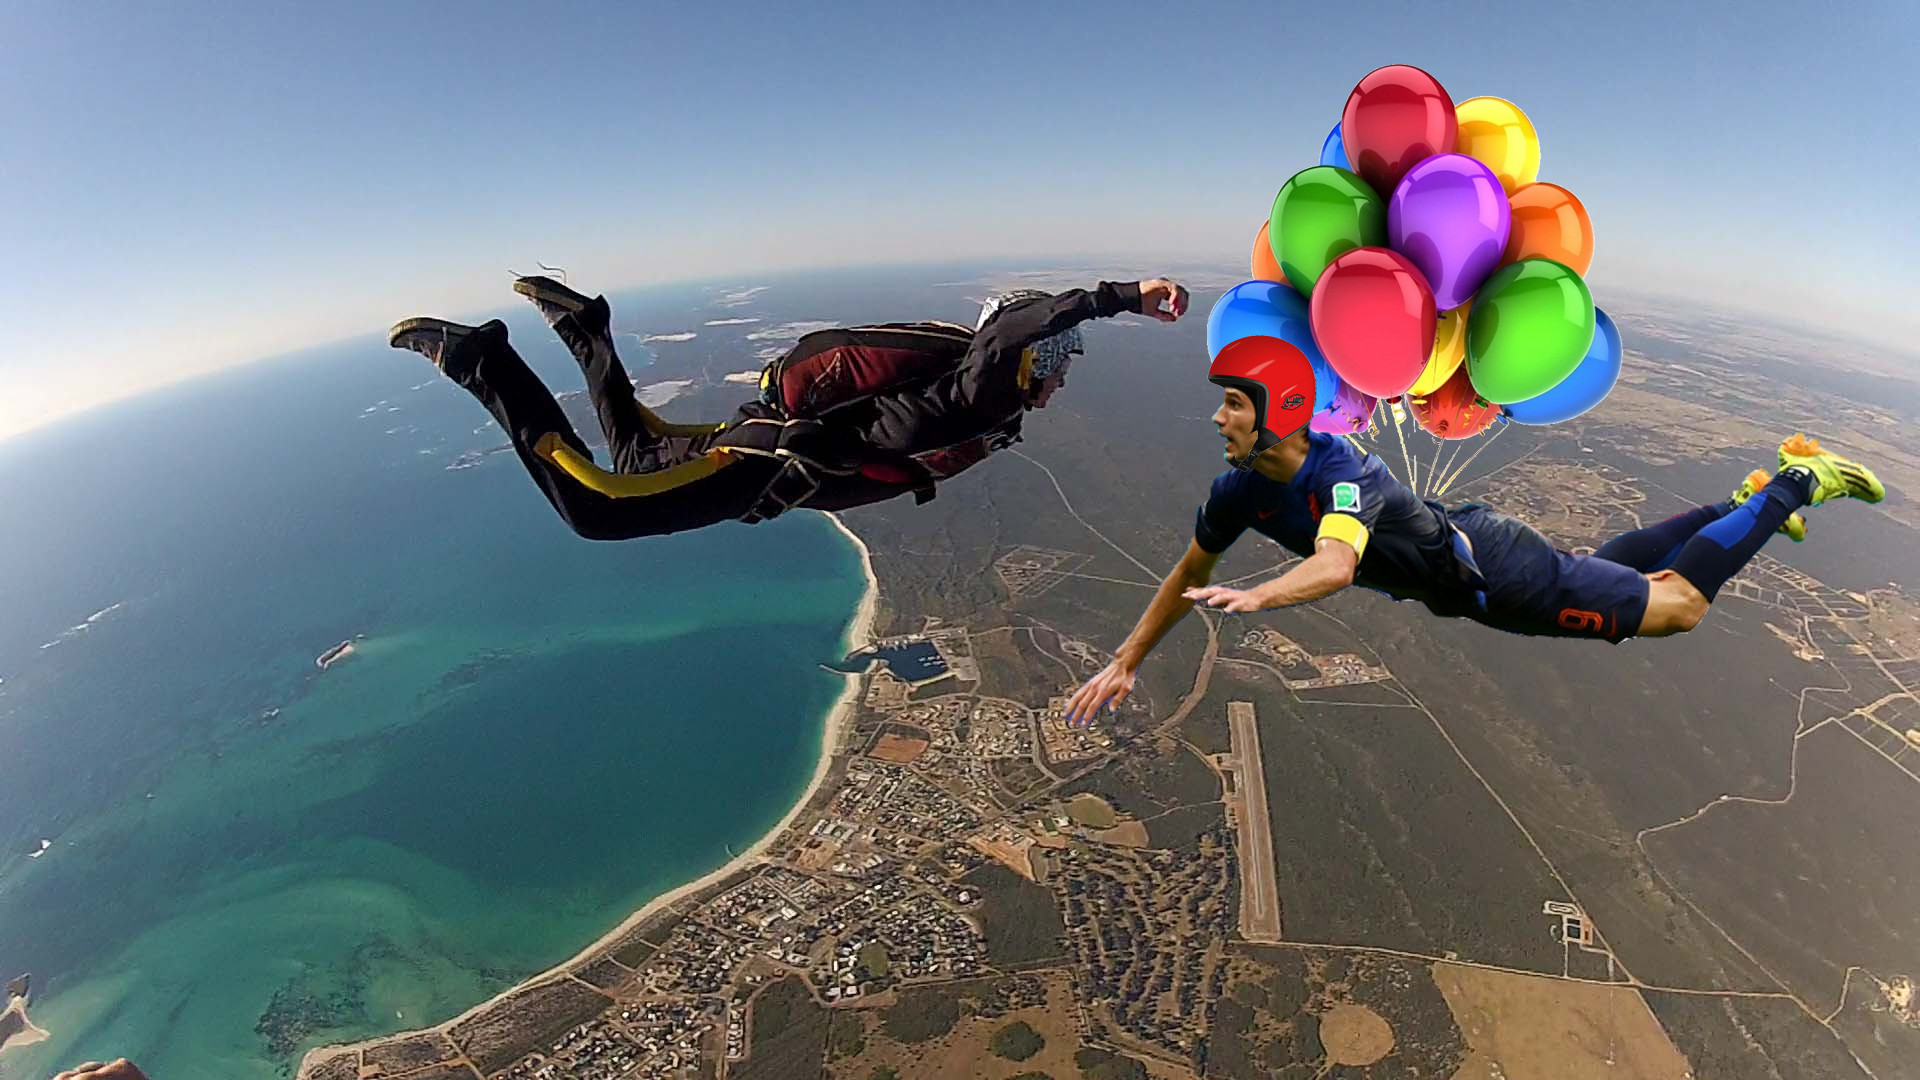 The Balloon Guy